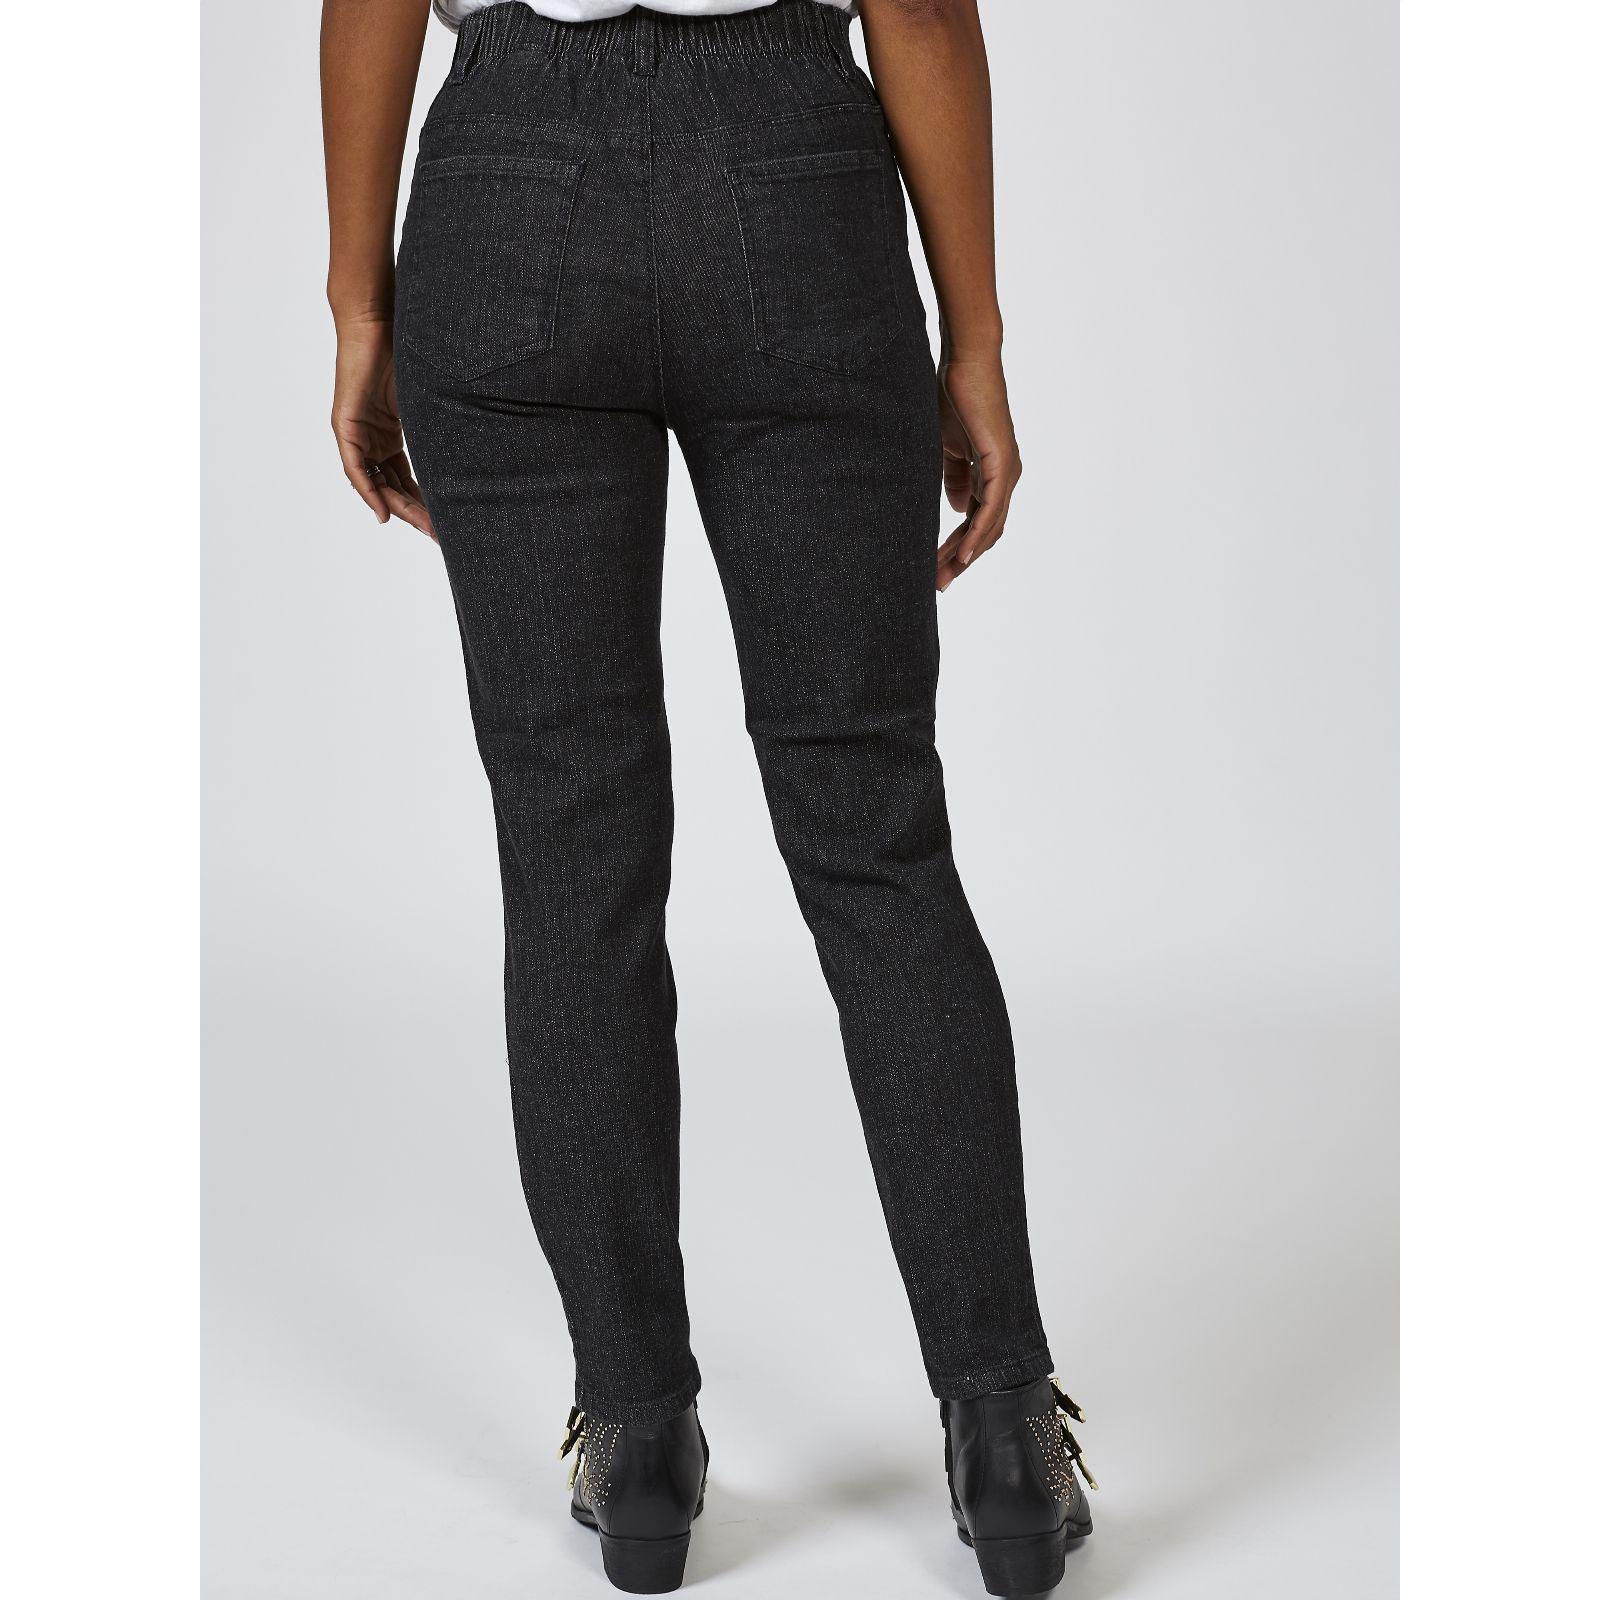 ed26ec2c8 Denim & Co. Classic Waist Stretch Skinny Jeans Regular - QVC UK